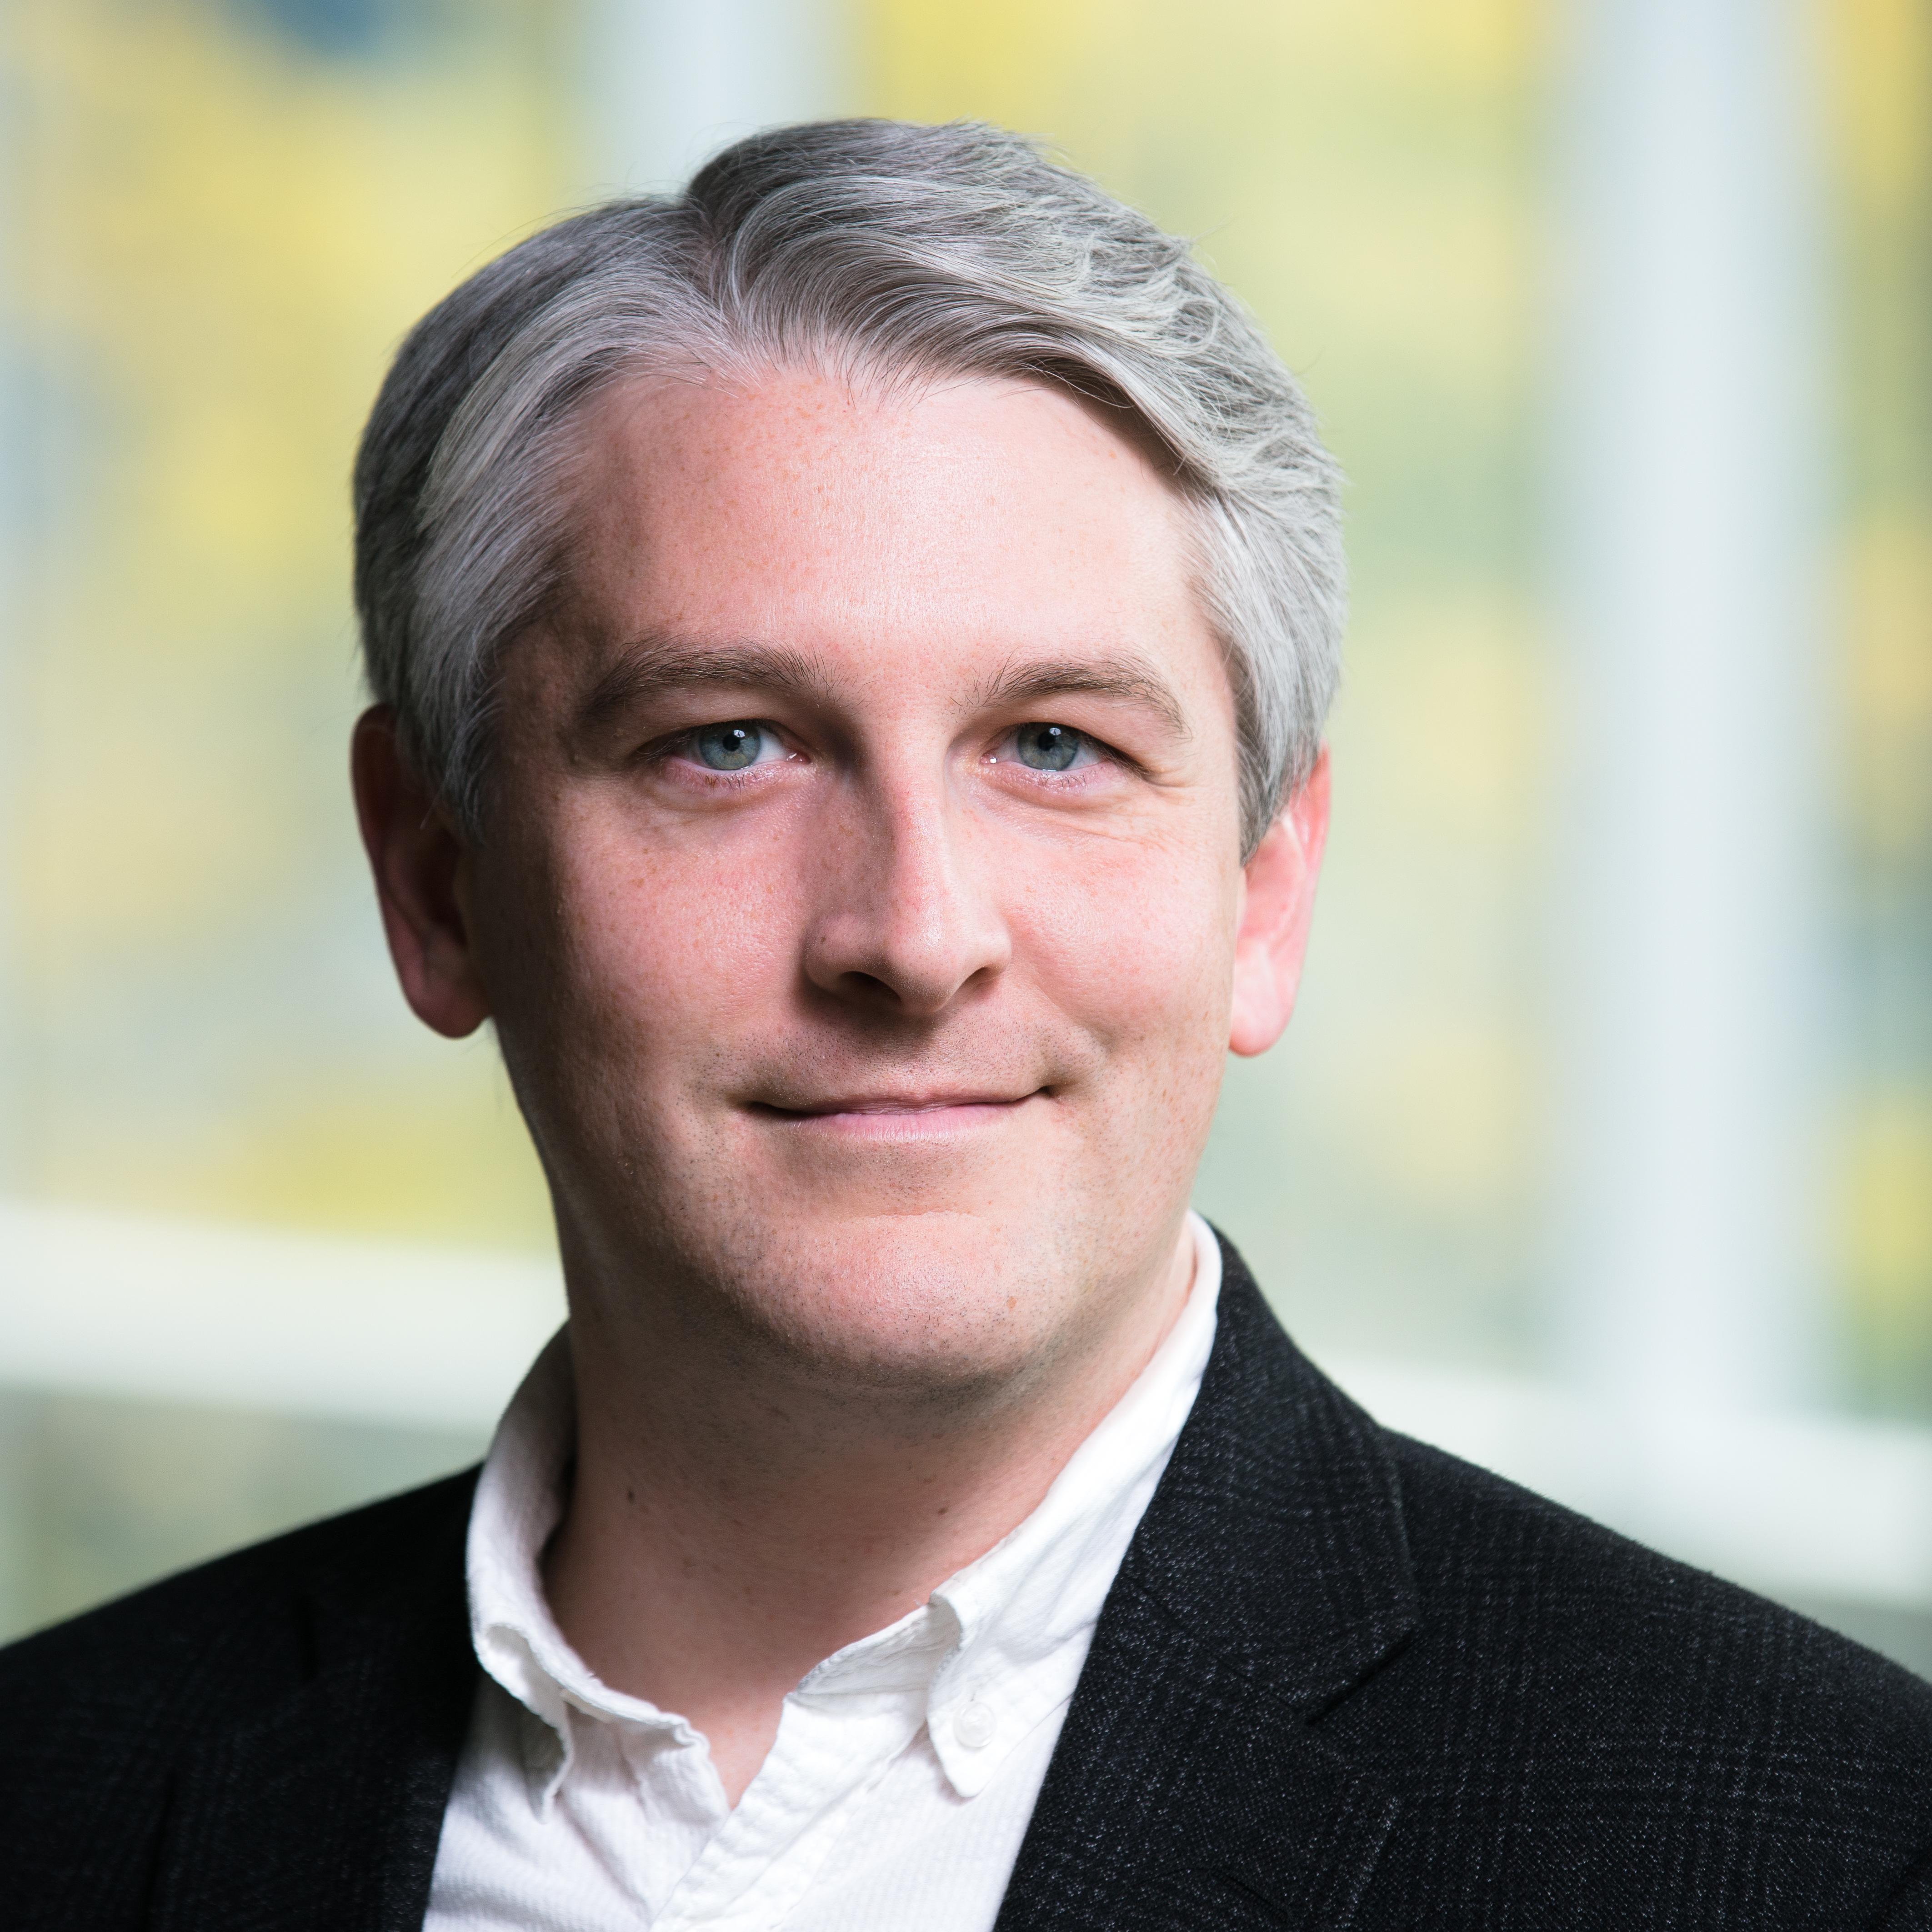 Dr. Michael McCulloch